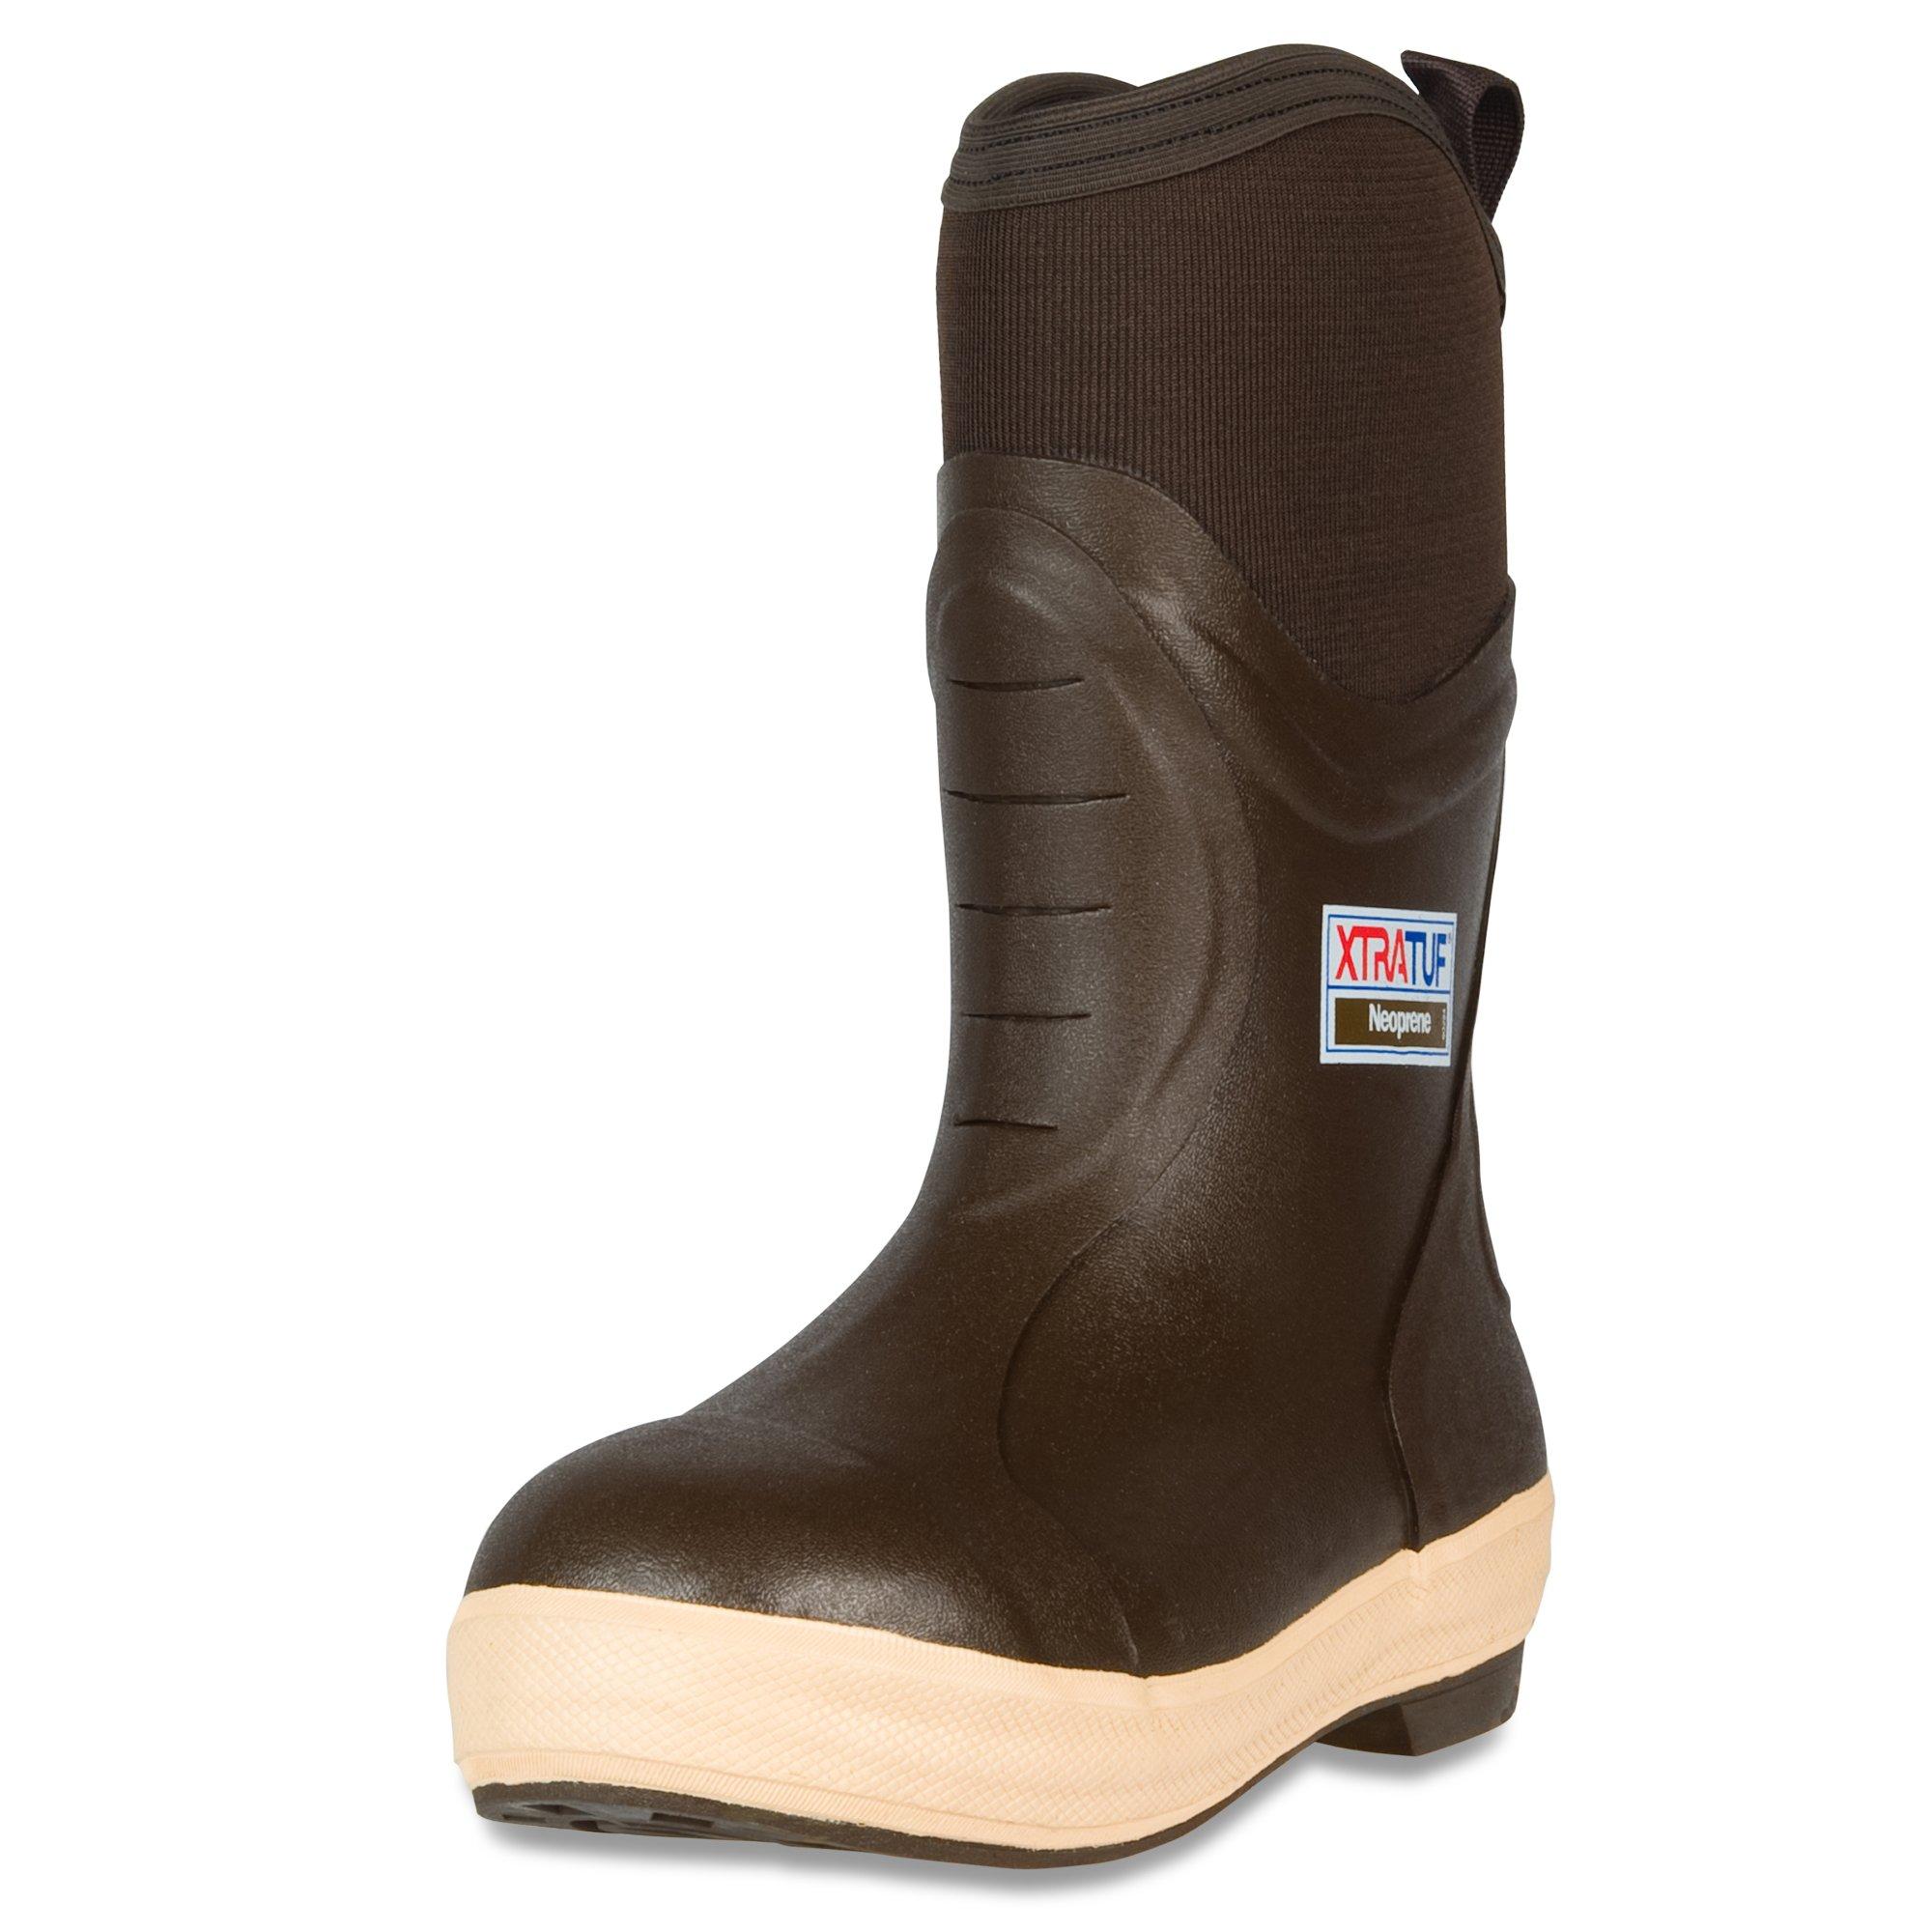 XTRATUF Elite Series 12'' Neoprene Insulated Men's Fishing Boots, Chocolate & Tan , 10 , (22612)